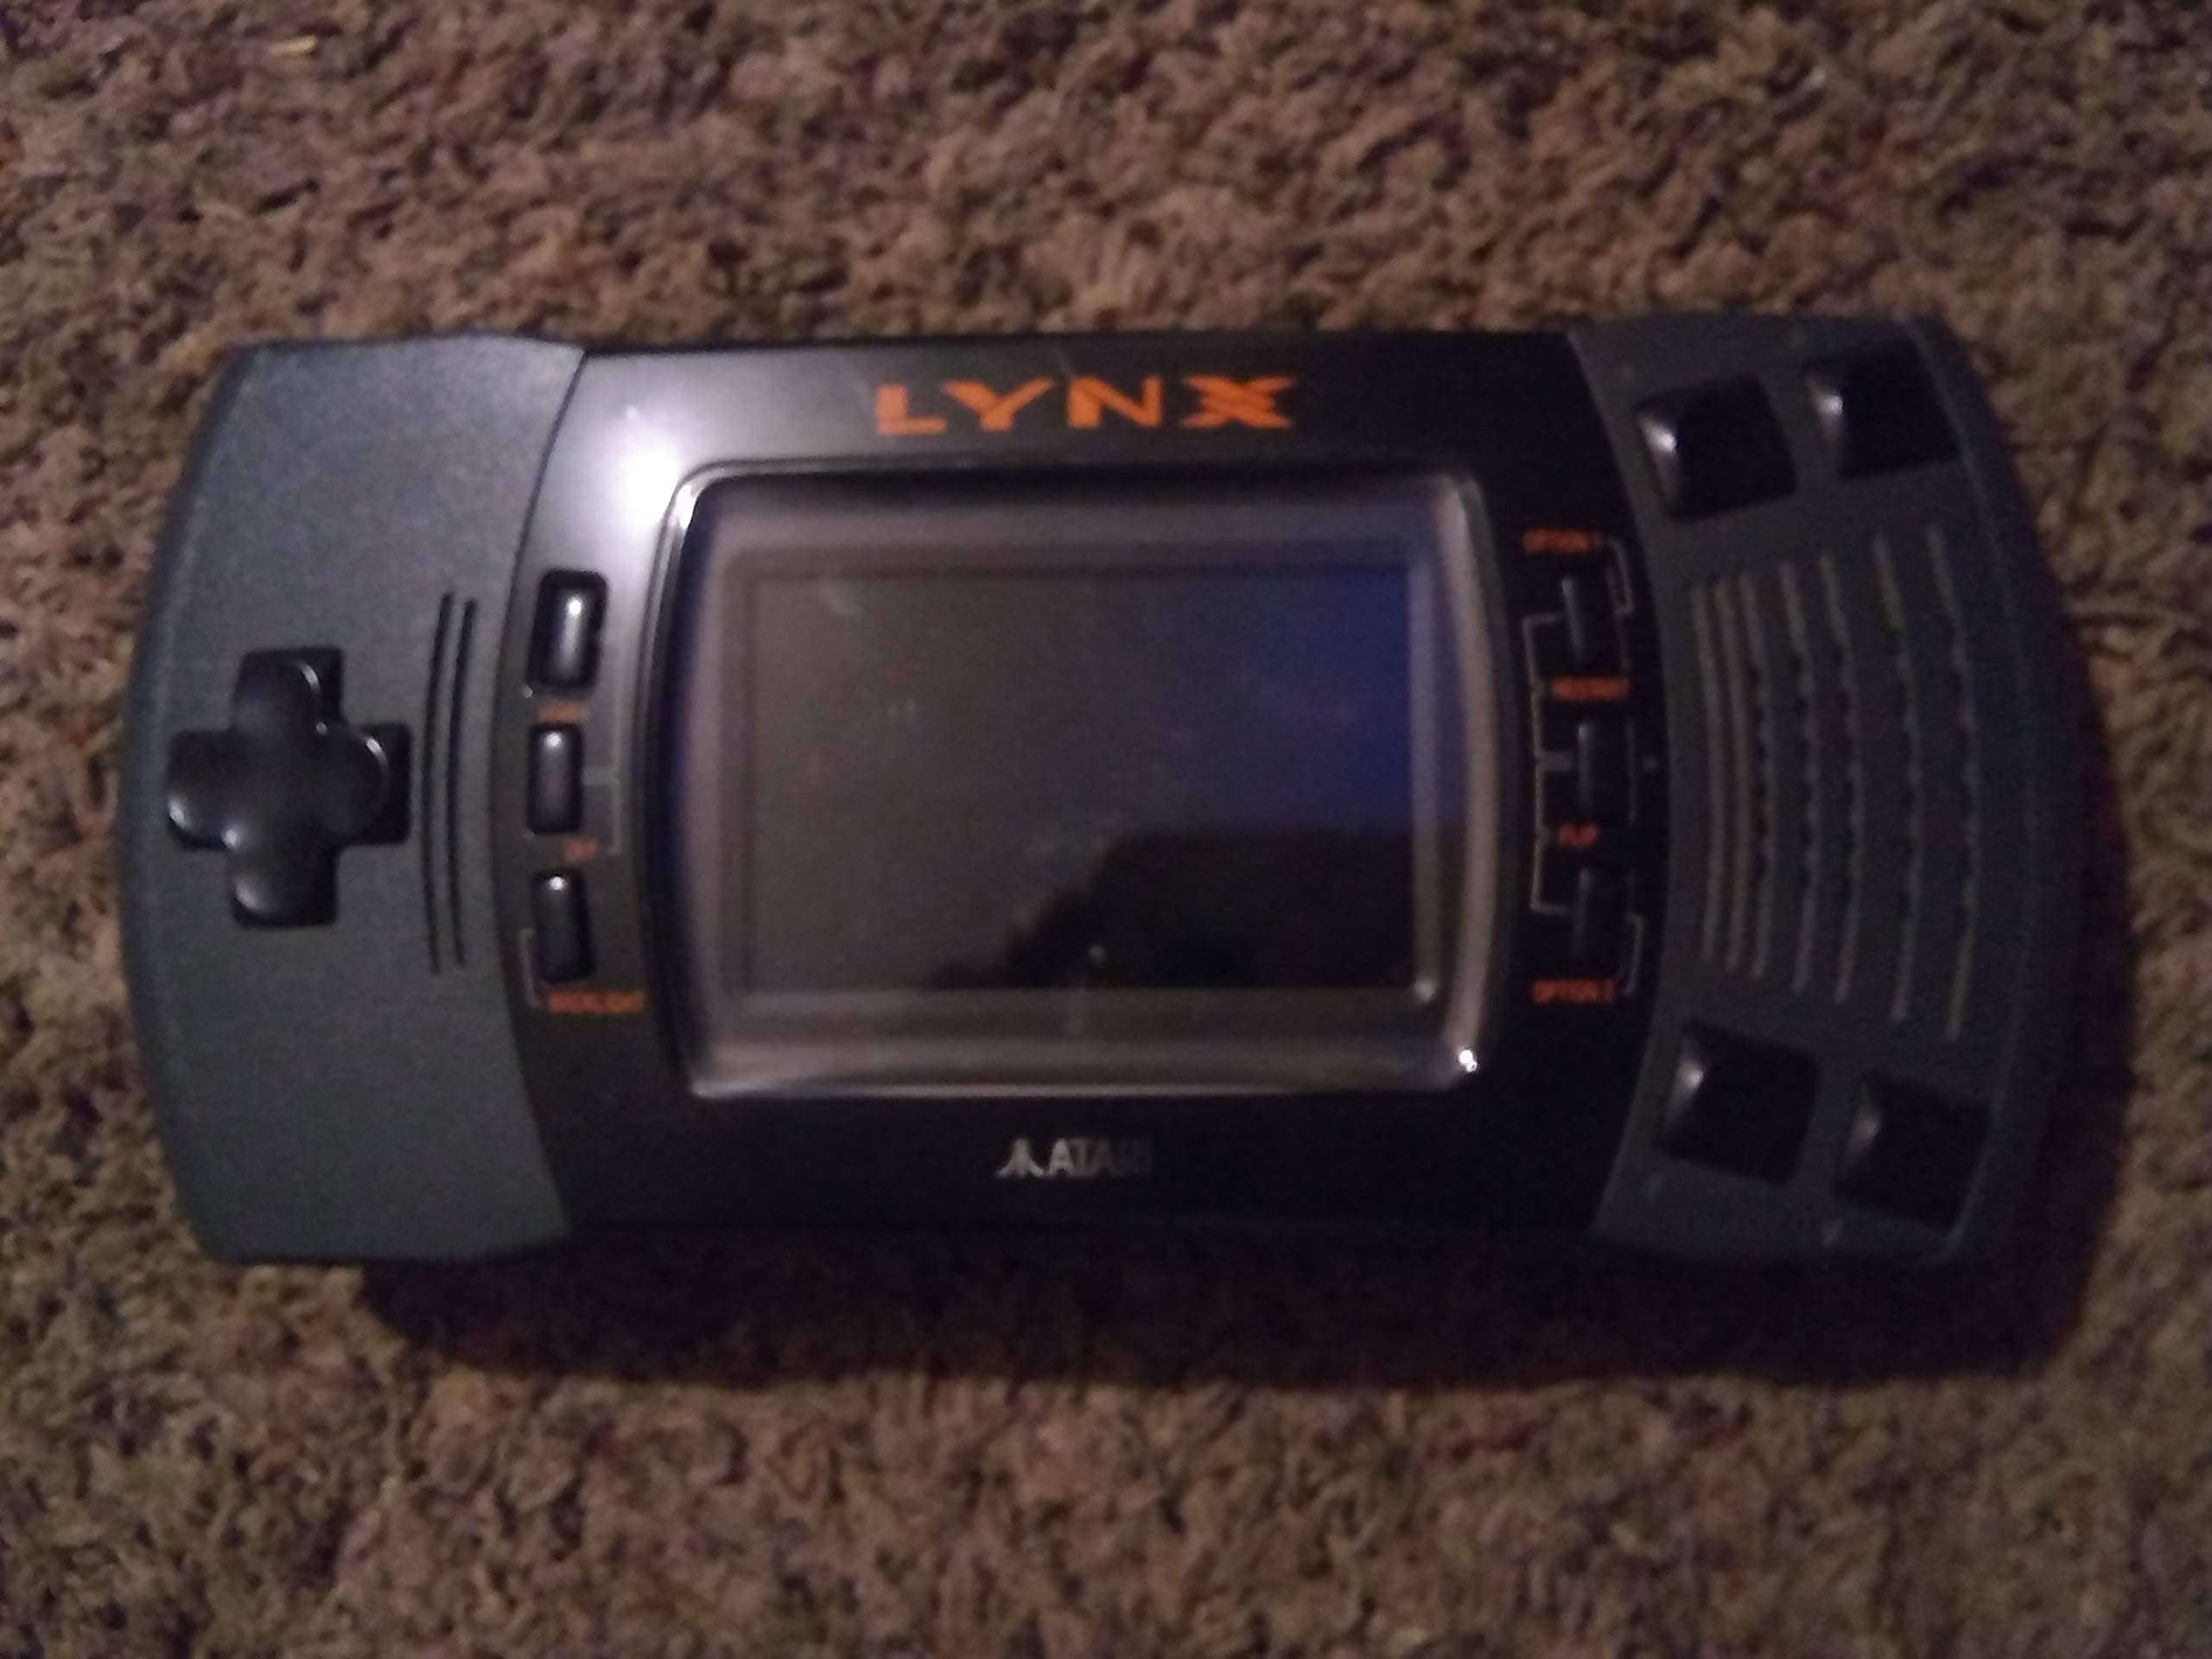 Amazon com: Atari Lynx 2 Portable Handheld Video Game System